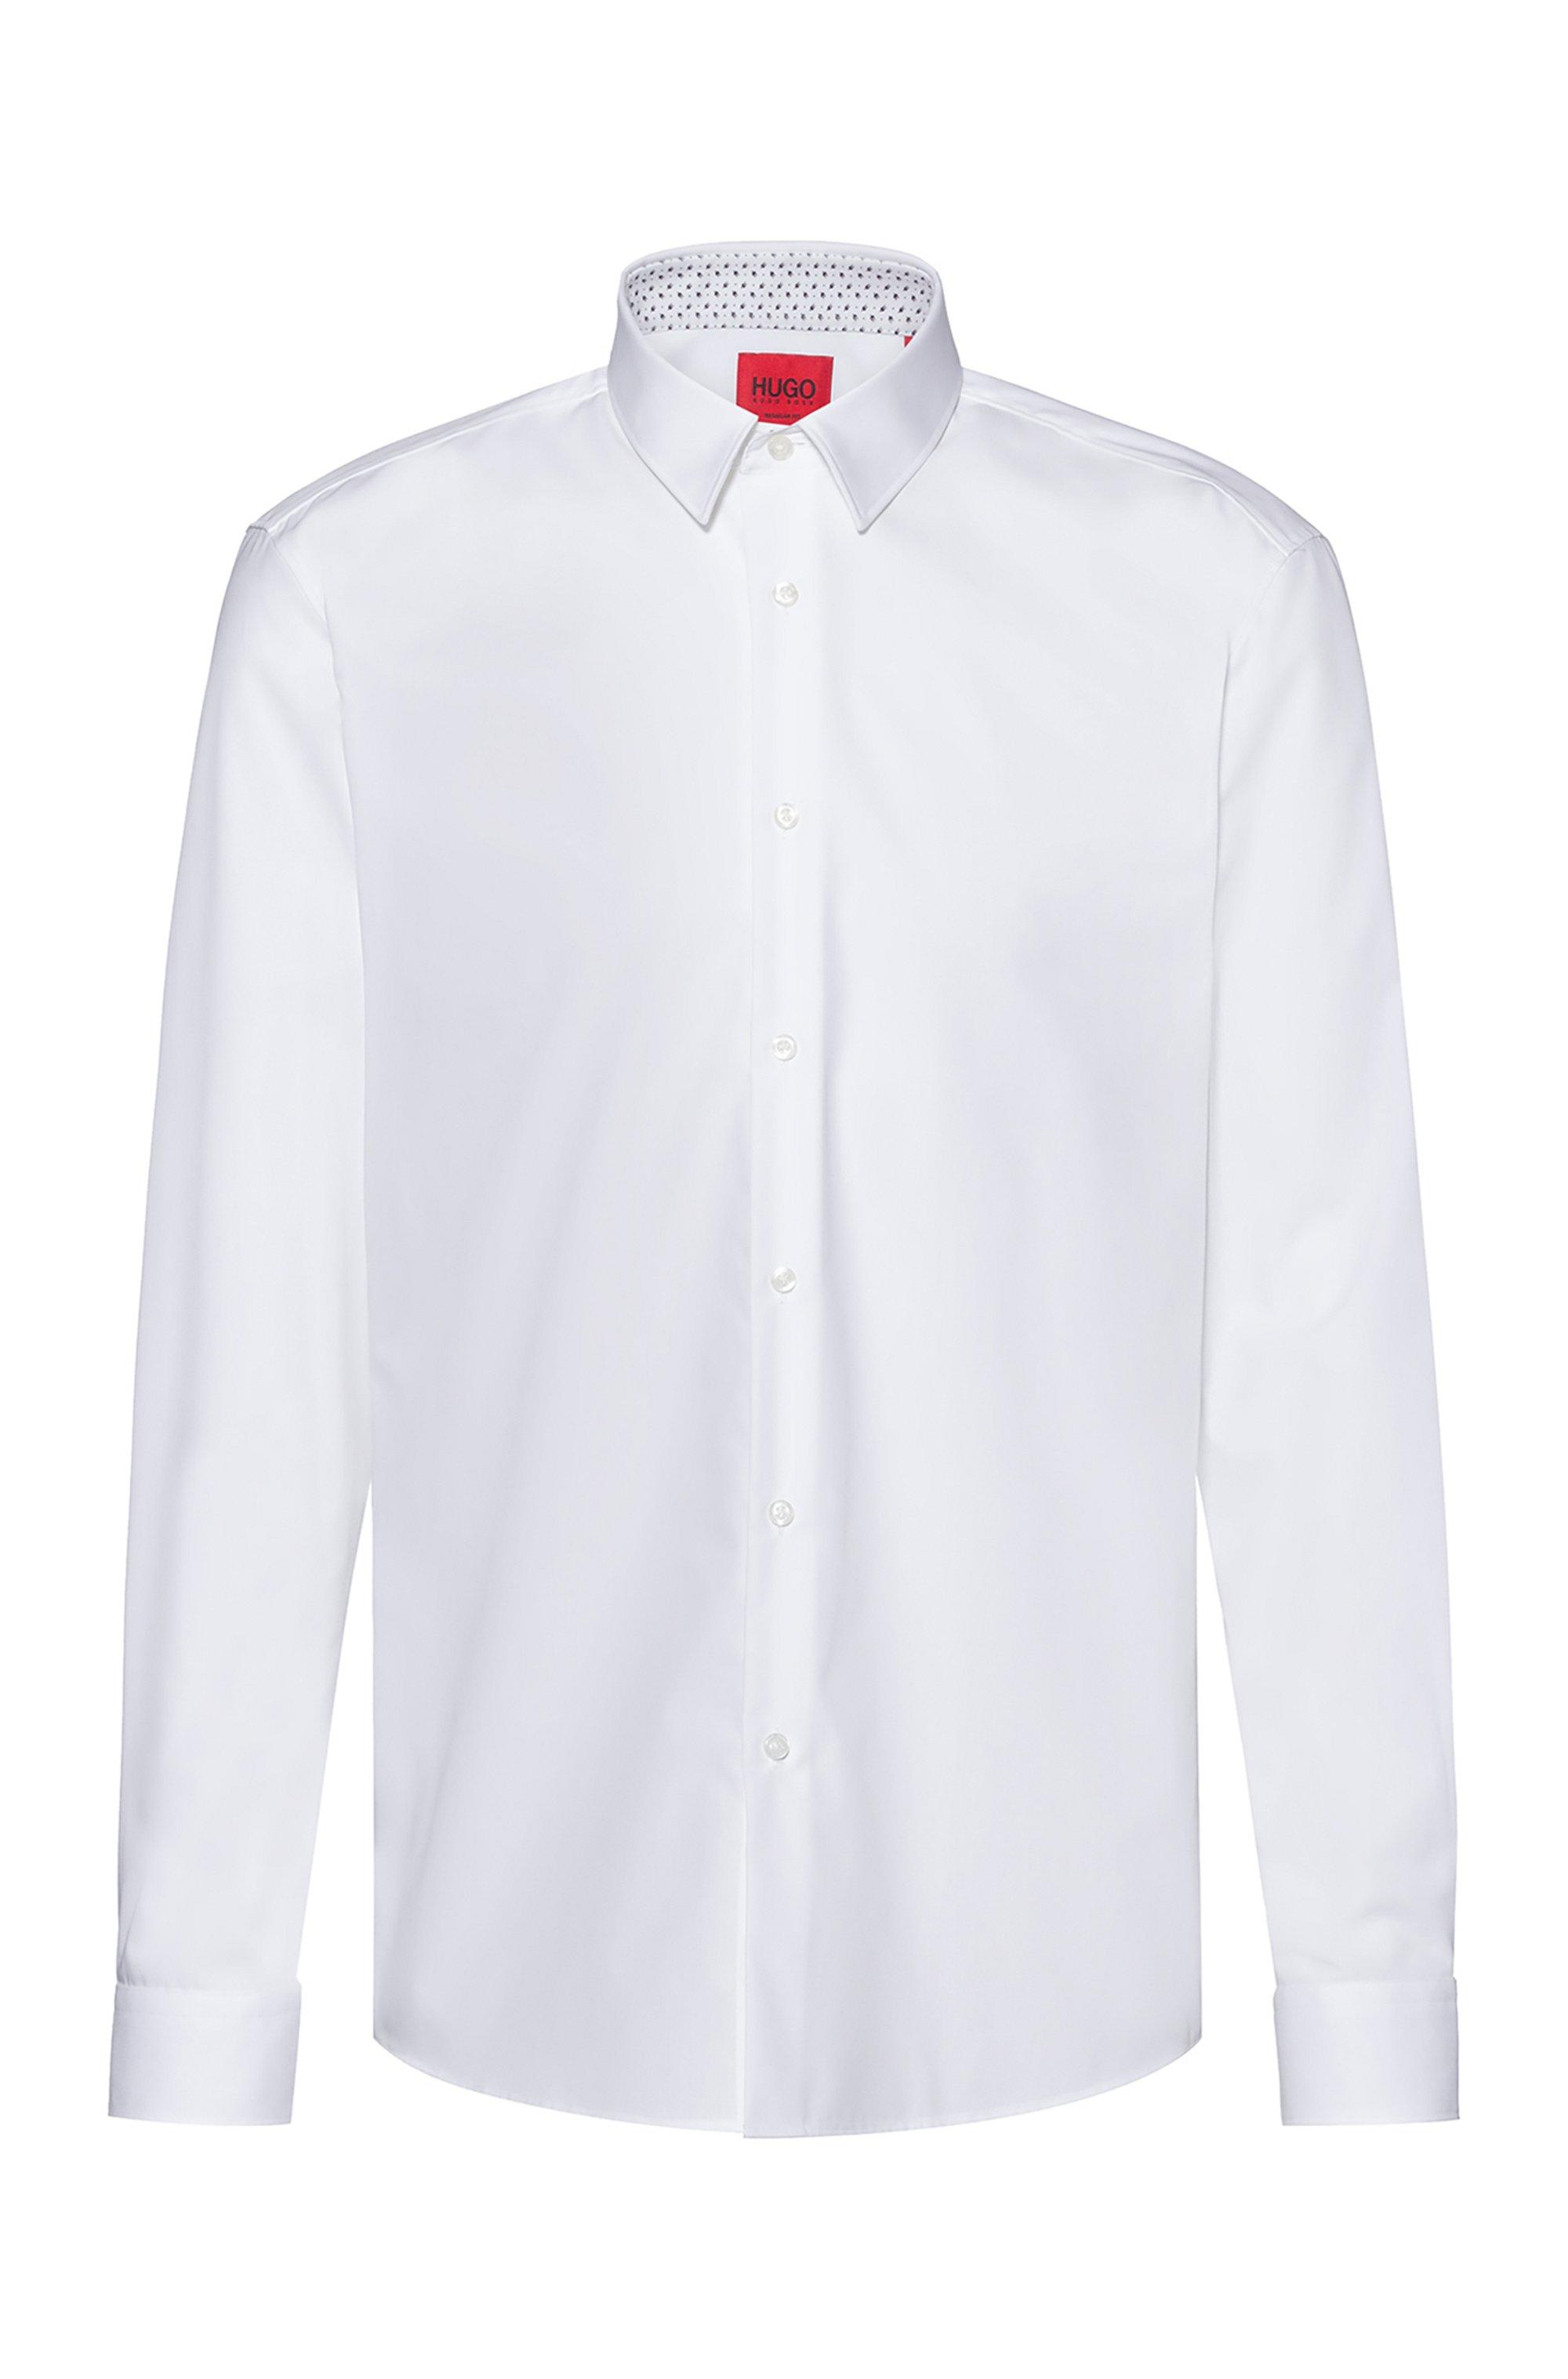 Easy-iron regular-fit shirt in signature cotton poplin, White